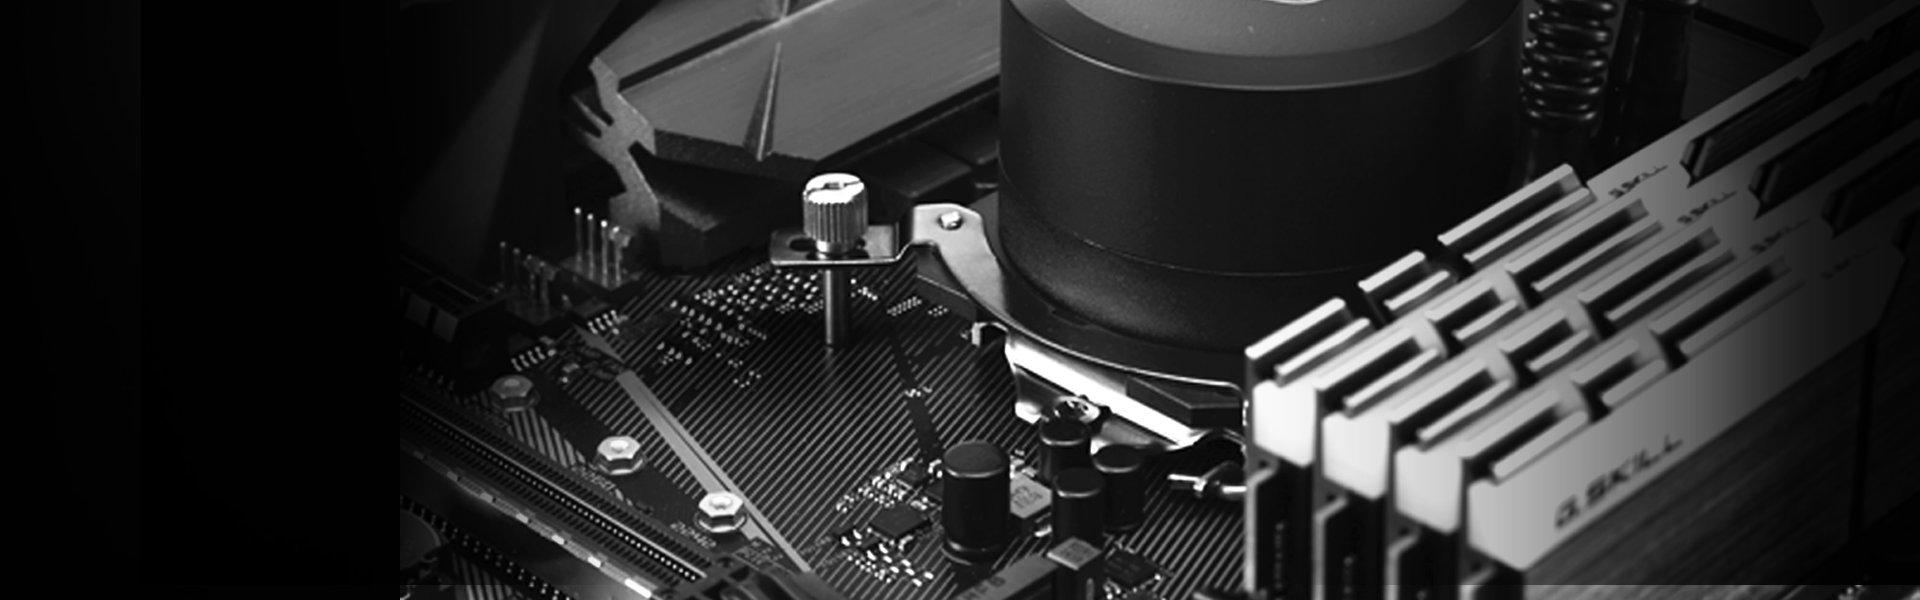 Cooler Master MasterLiquid Lite 240 Liquid CPU Cooler 240mm Radiator, 2 x MasterFan Air Balance 120 Fans, Dual-Chamber Pump MLW-D24M-A20PW-R1 by Cooler Master (Image #9)